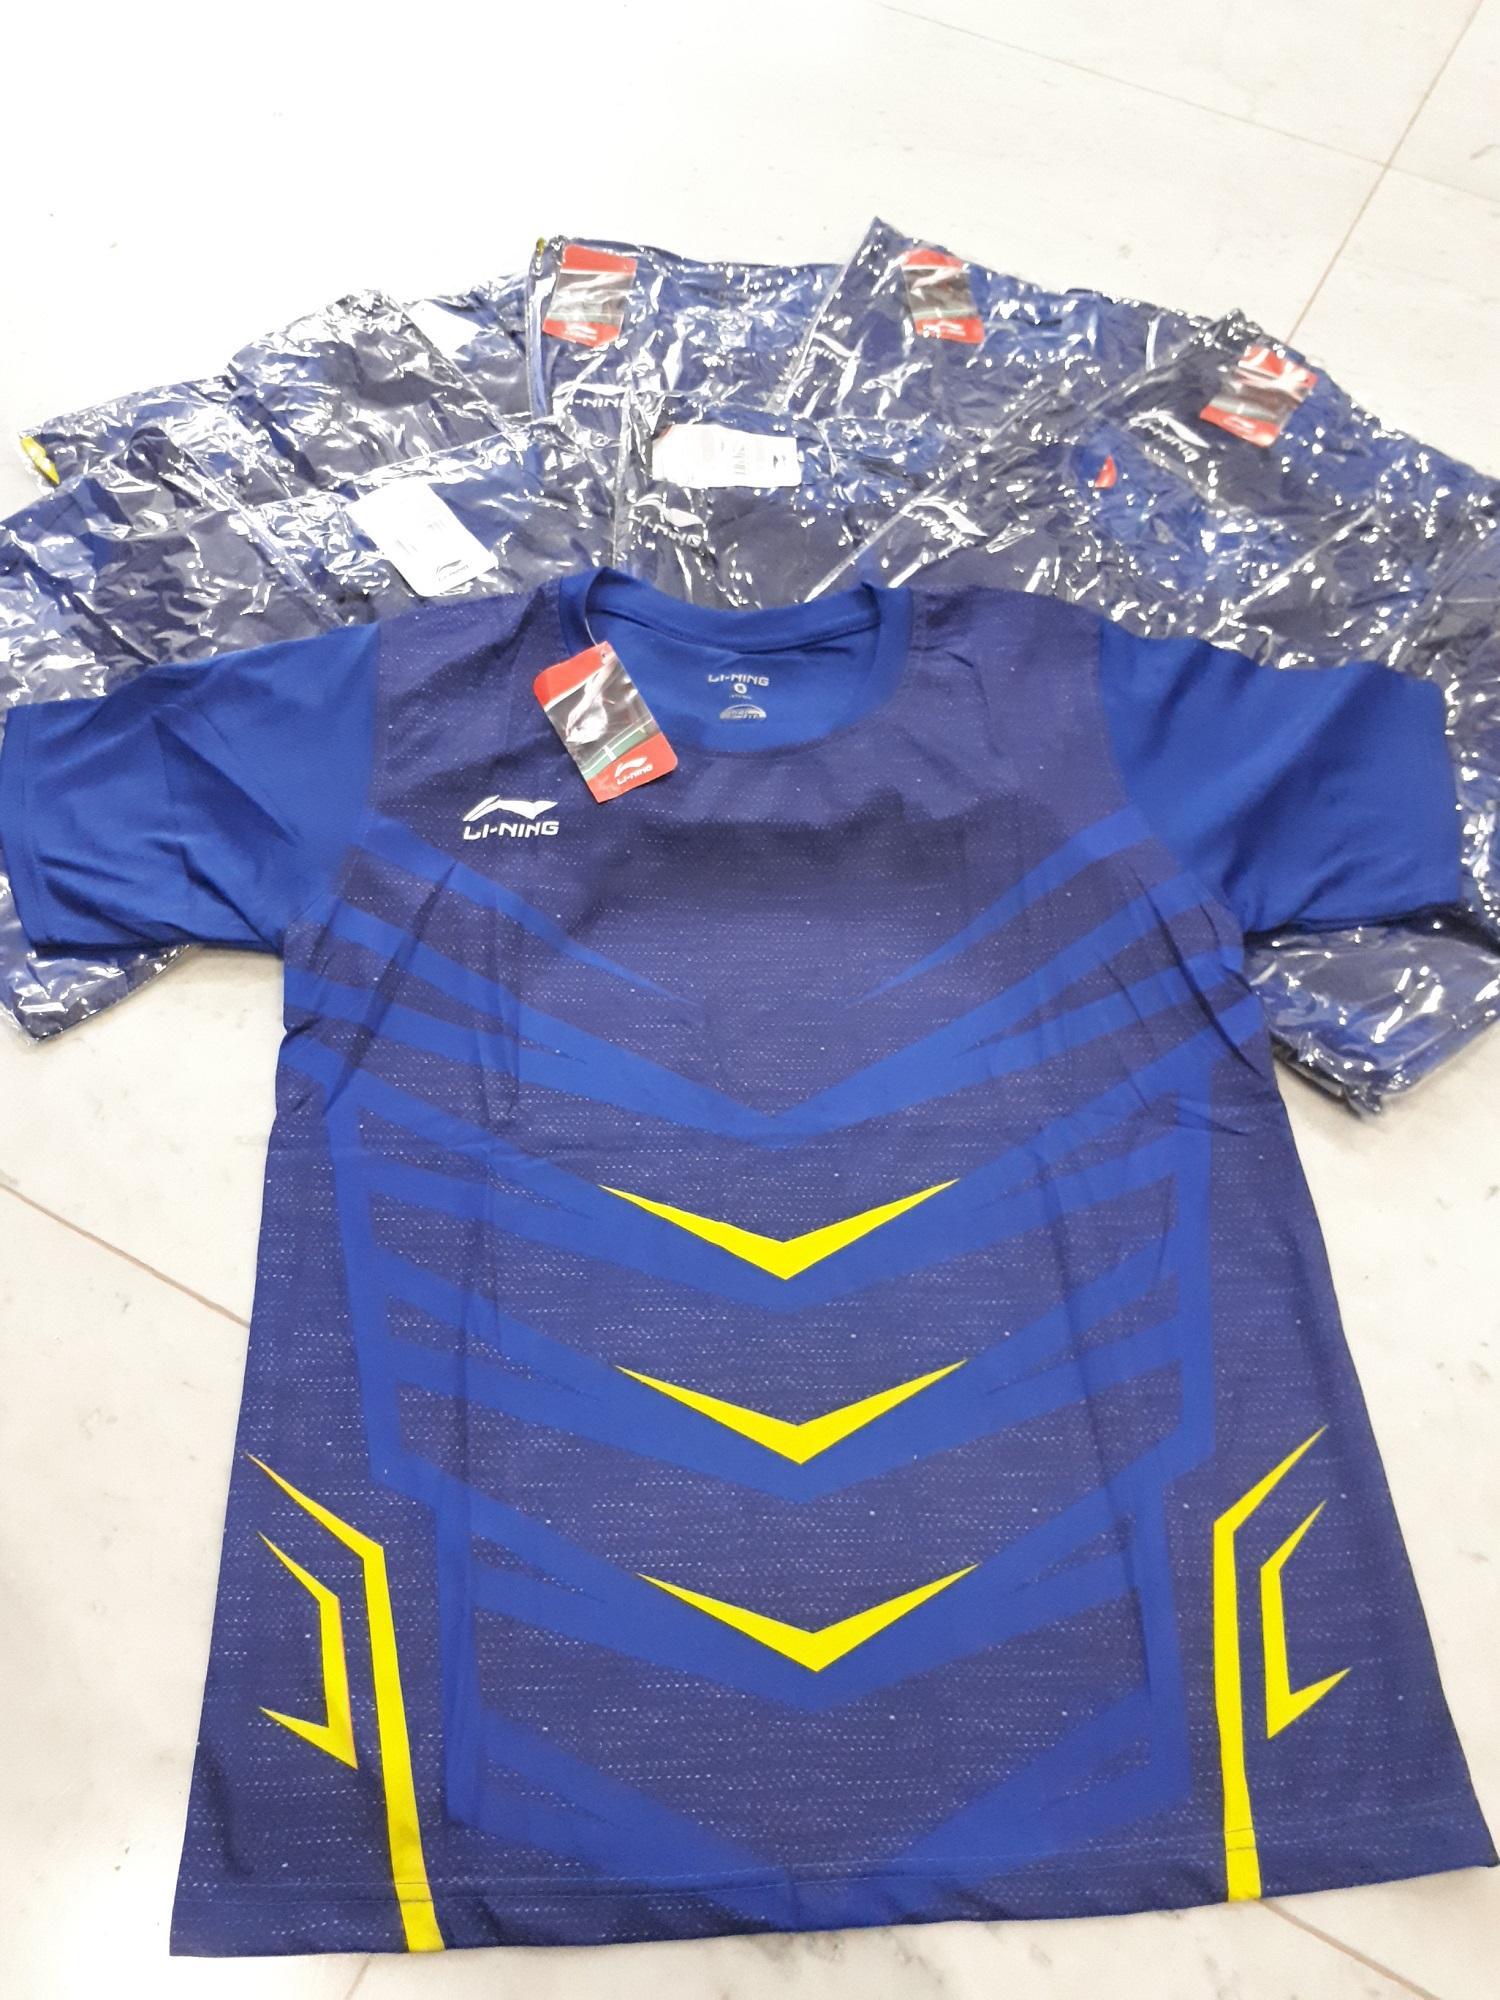 Fox- Baju Badminton Li-Ning/ Kaos Lining Badminton/ Pakaian olah raga/ Kaos Bulu Tangkis.